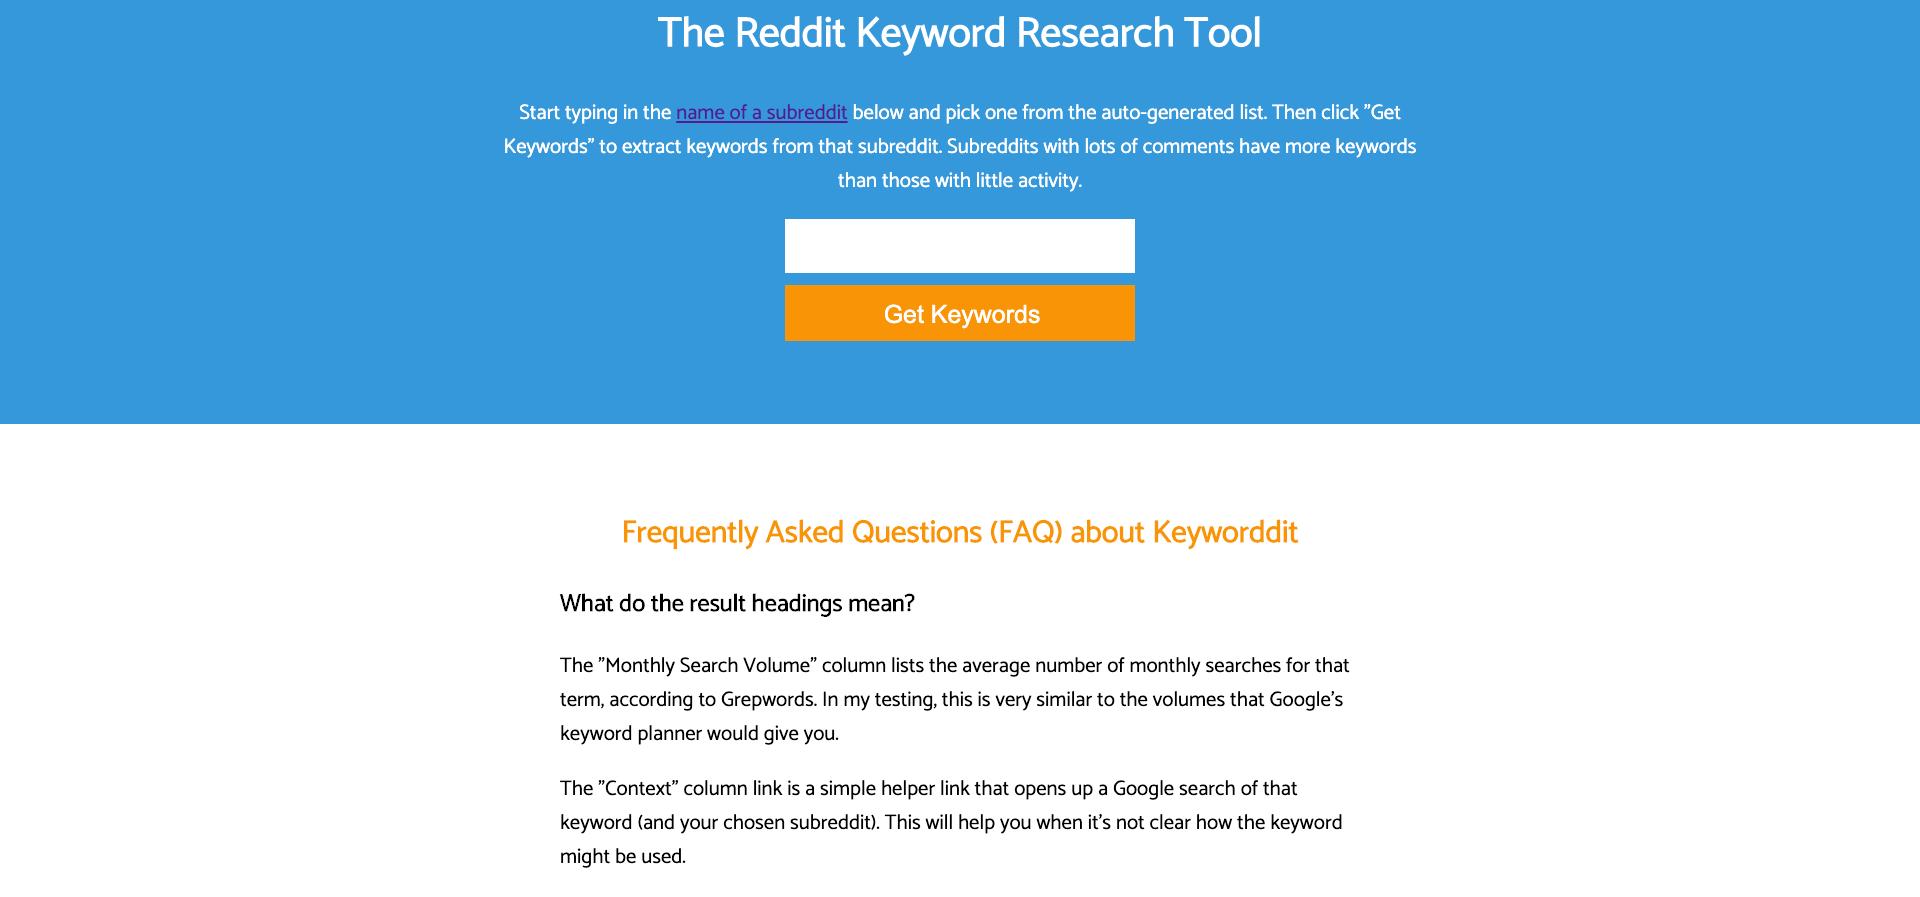 The Reddit Keyword Research Tool